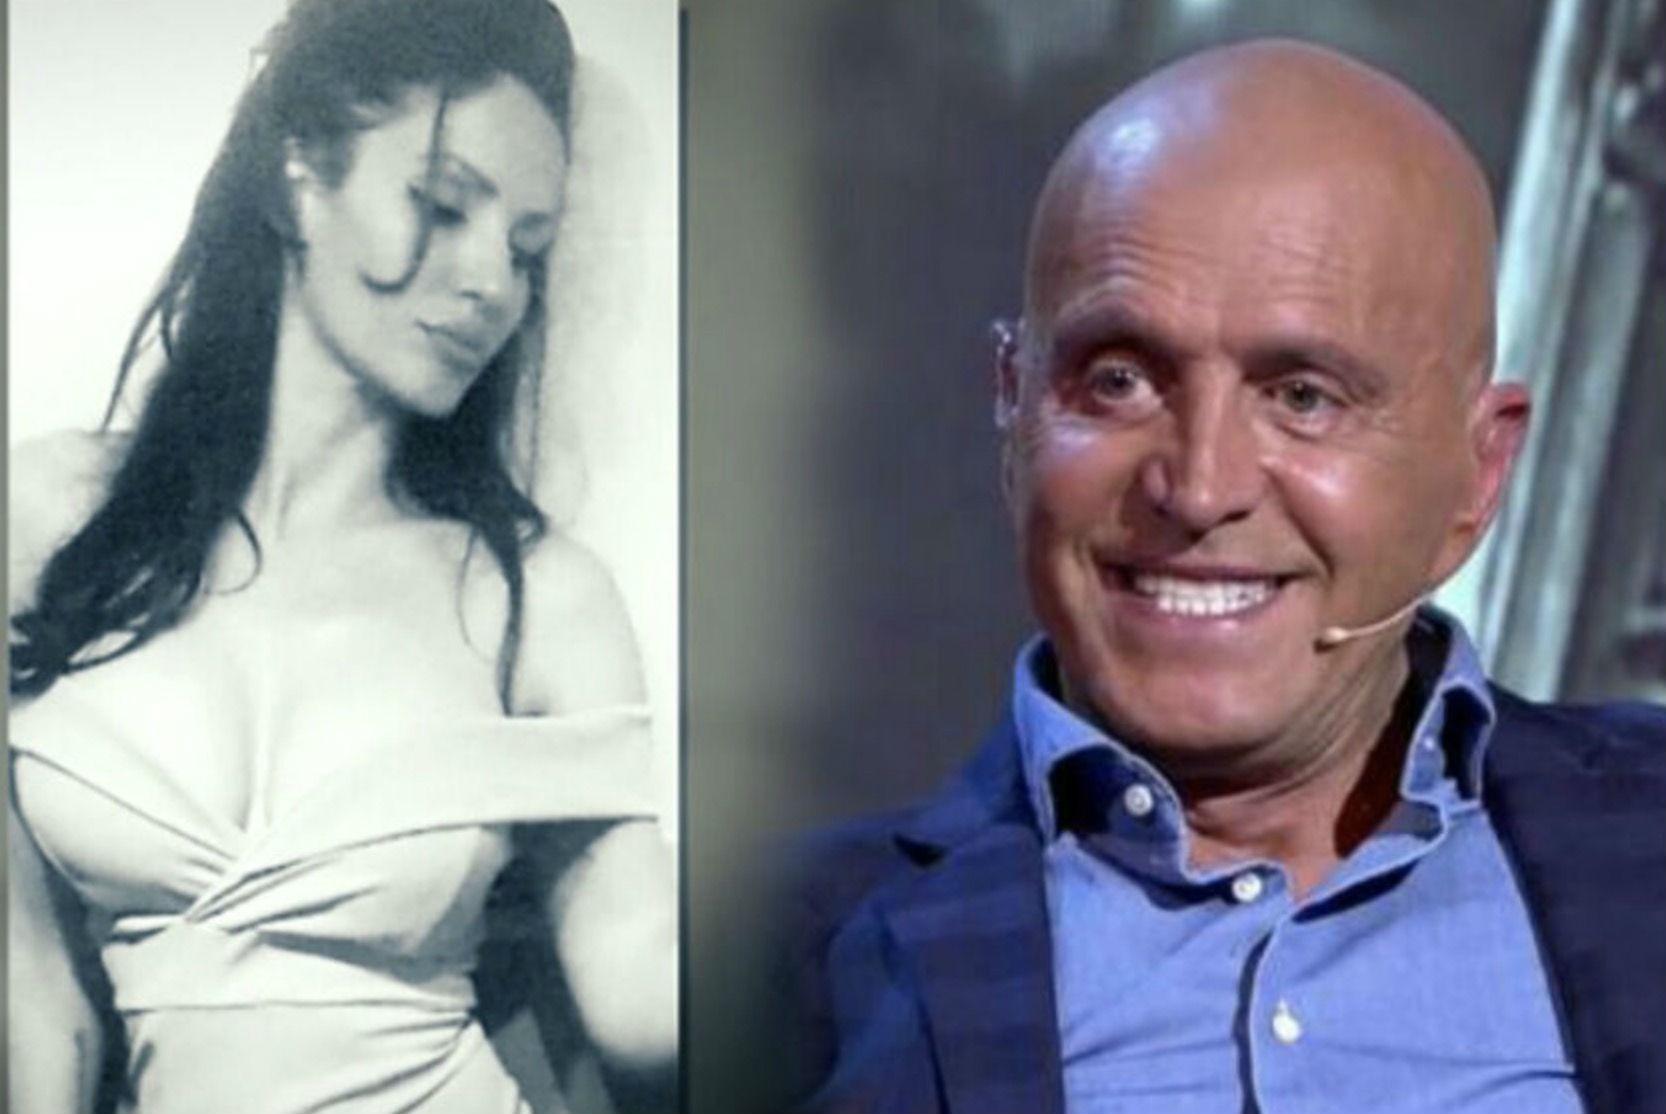 La nueva novia de Kiko Matamoros es un clon de Angelina Jolie